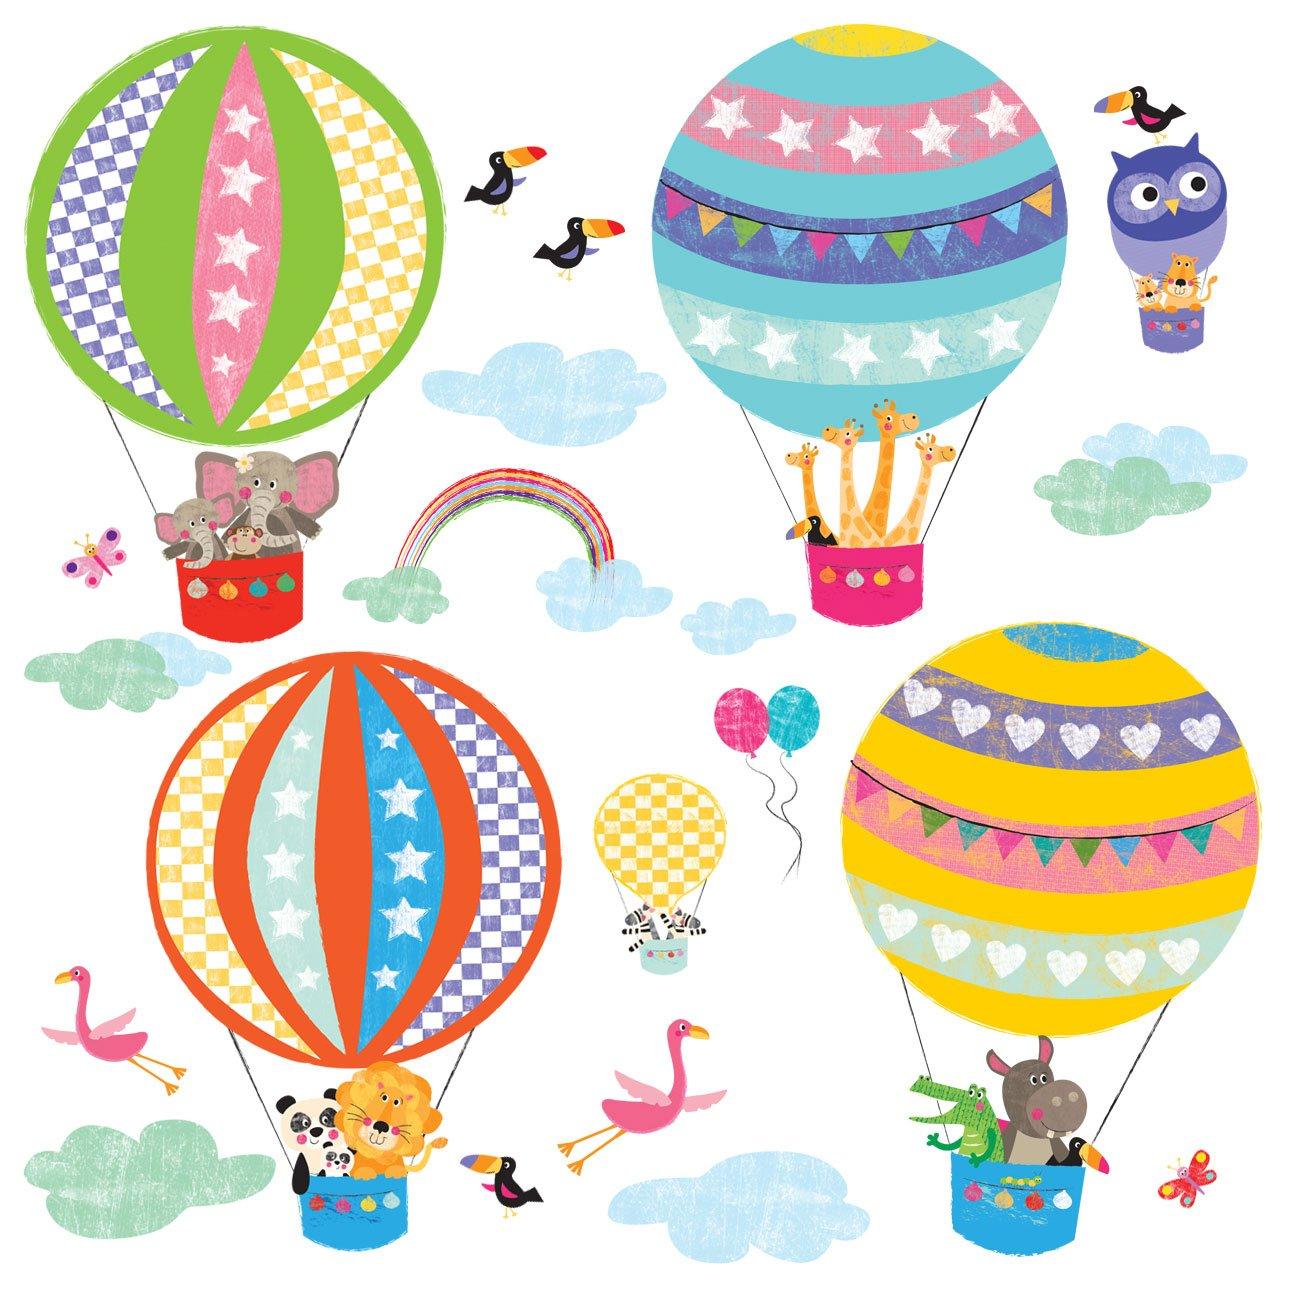 Decowall DA-1710B Hot Air Balloon Animals Peel and Stick Nursery Kids Wall Stickers Decals